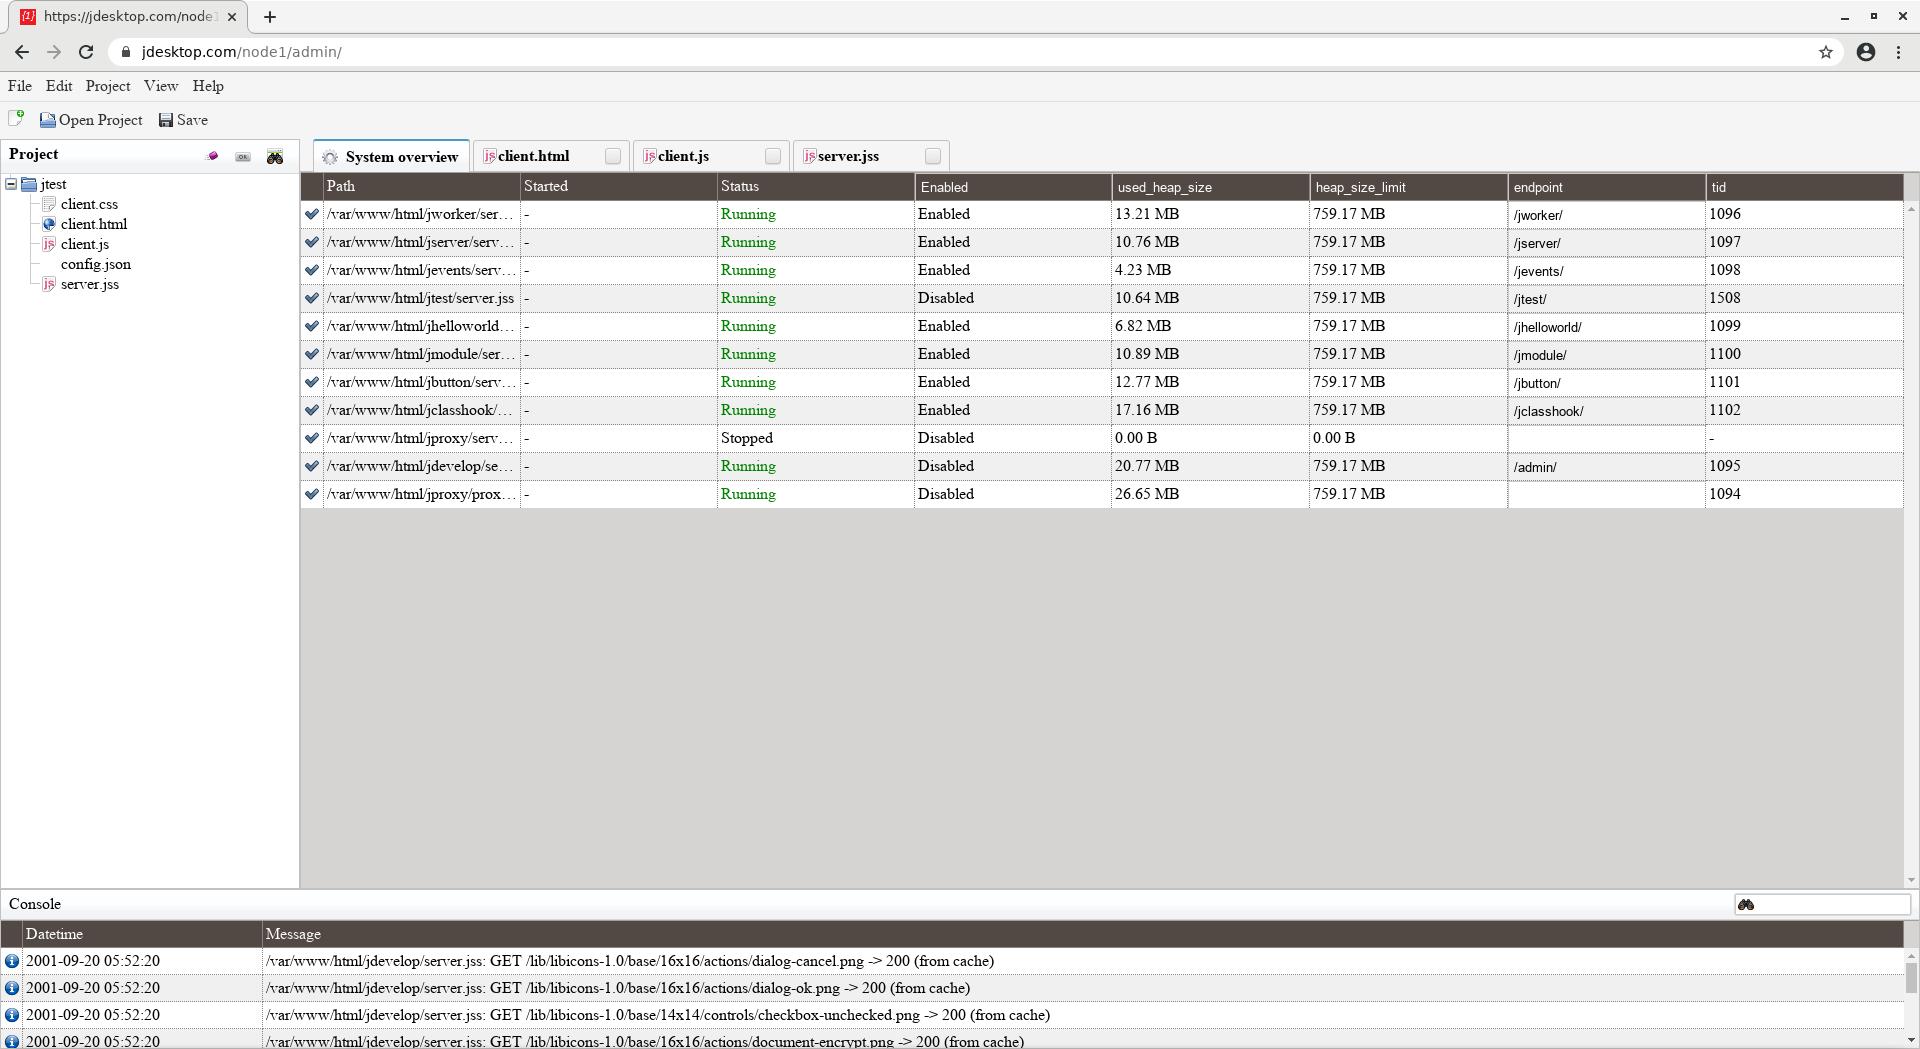 Screenshot_2020-09-20_19-53-10